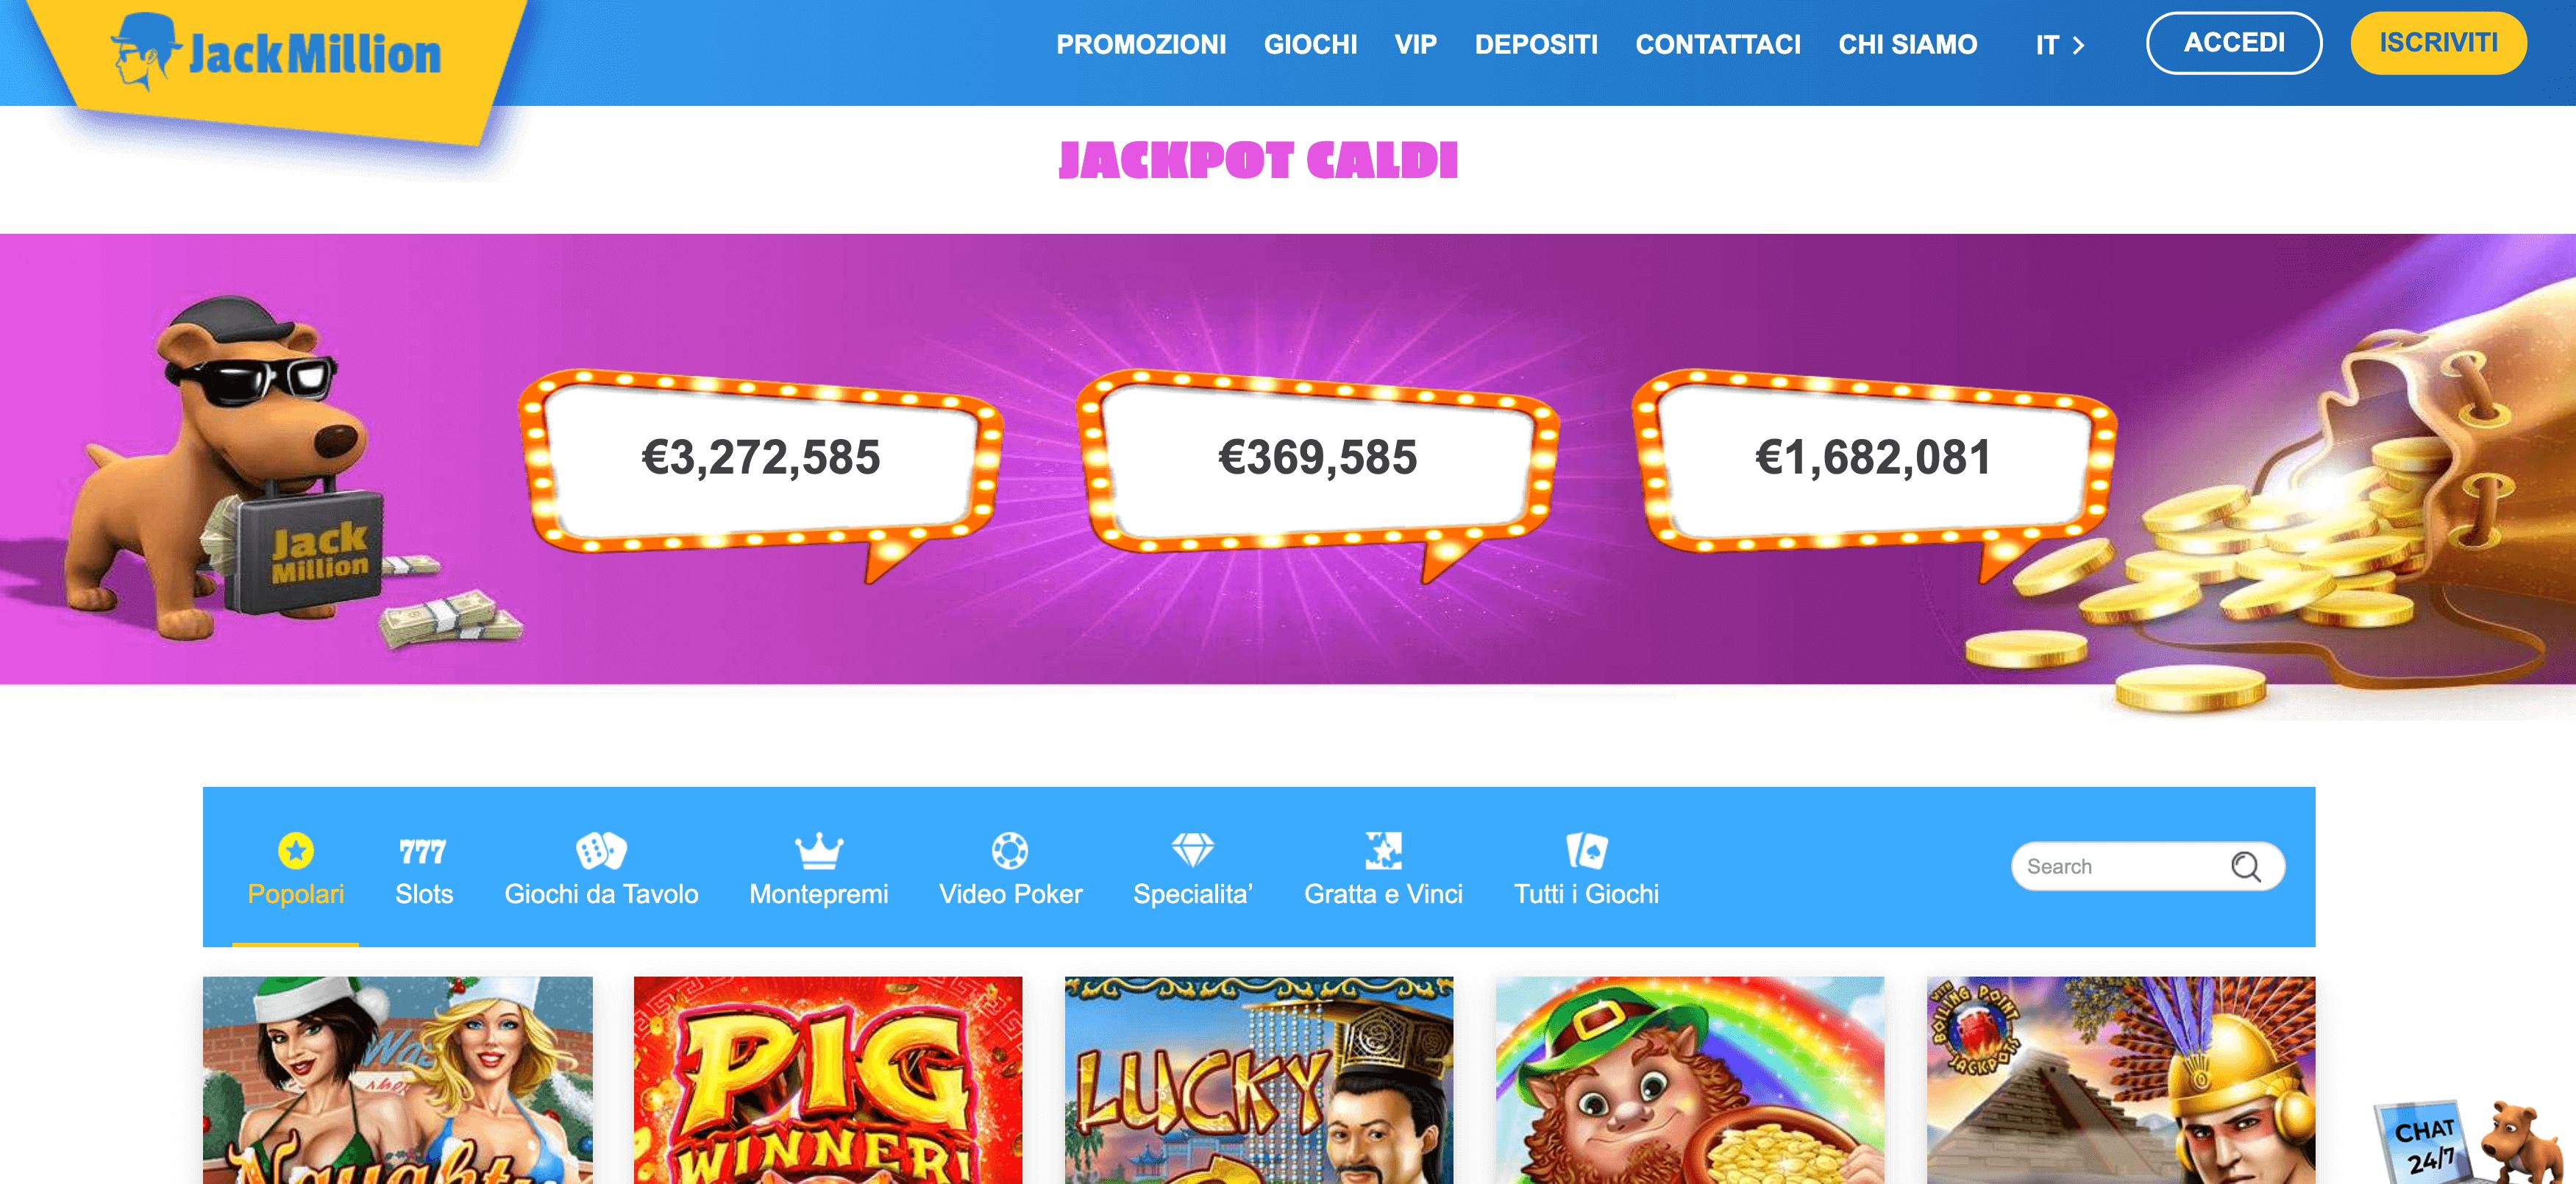 jackmillion casino homepage